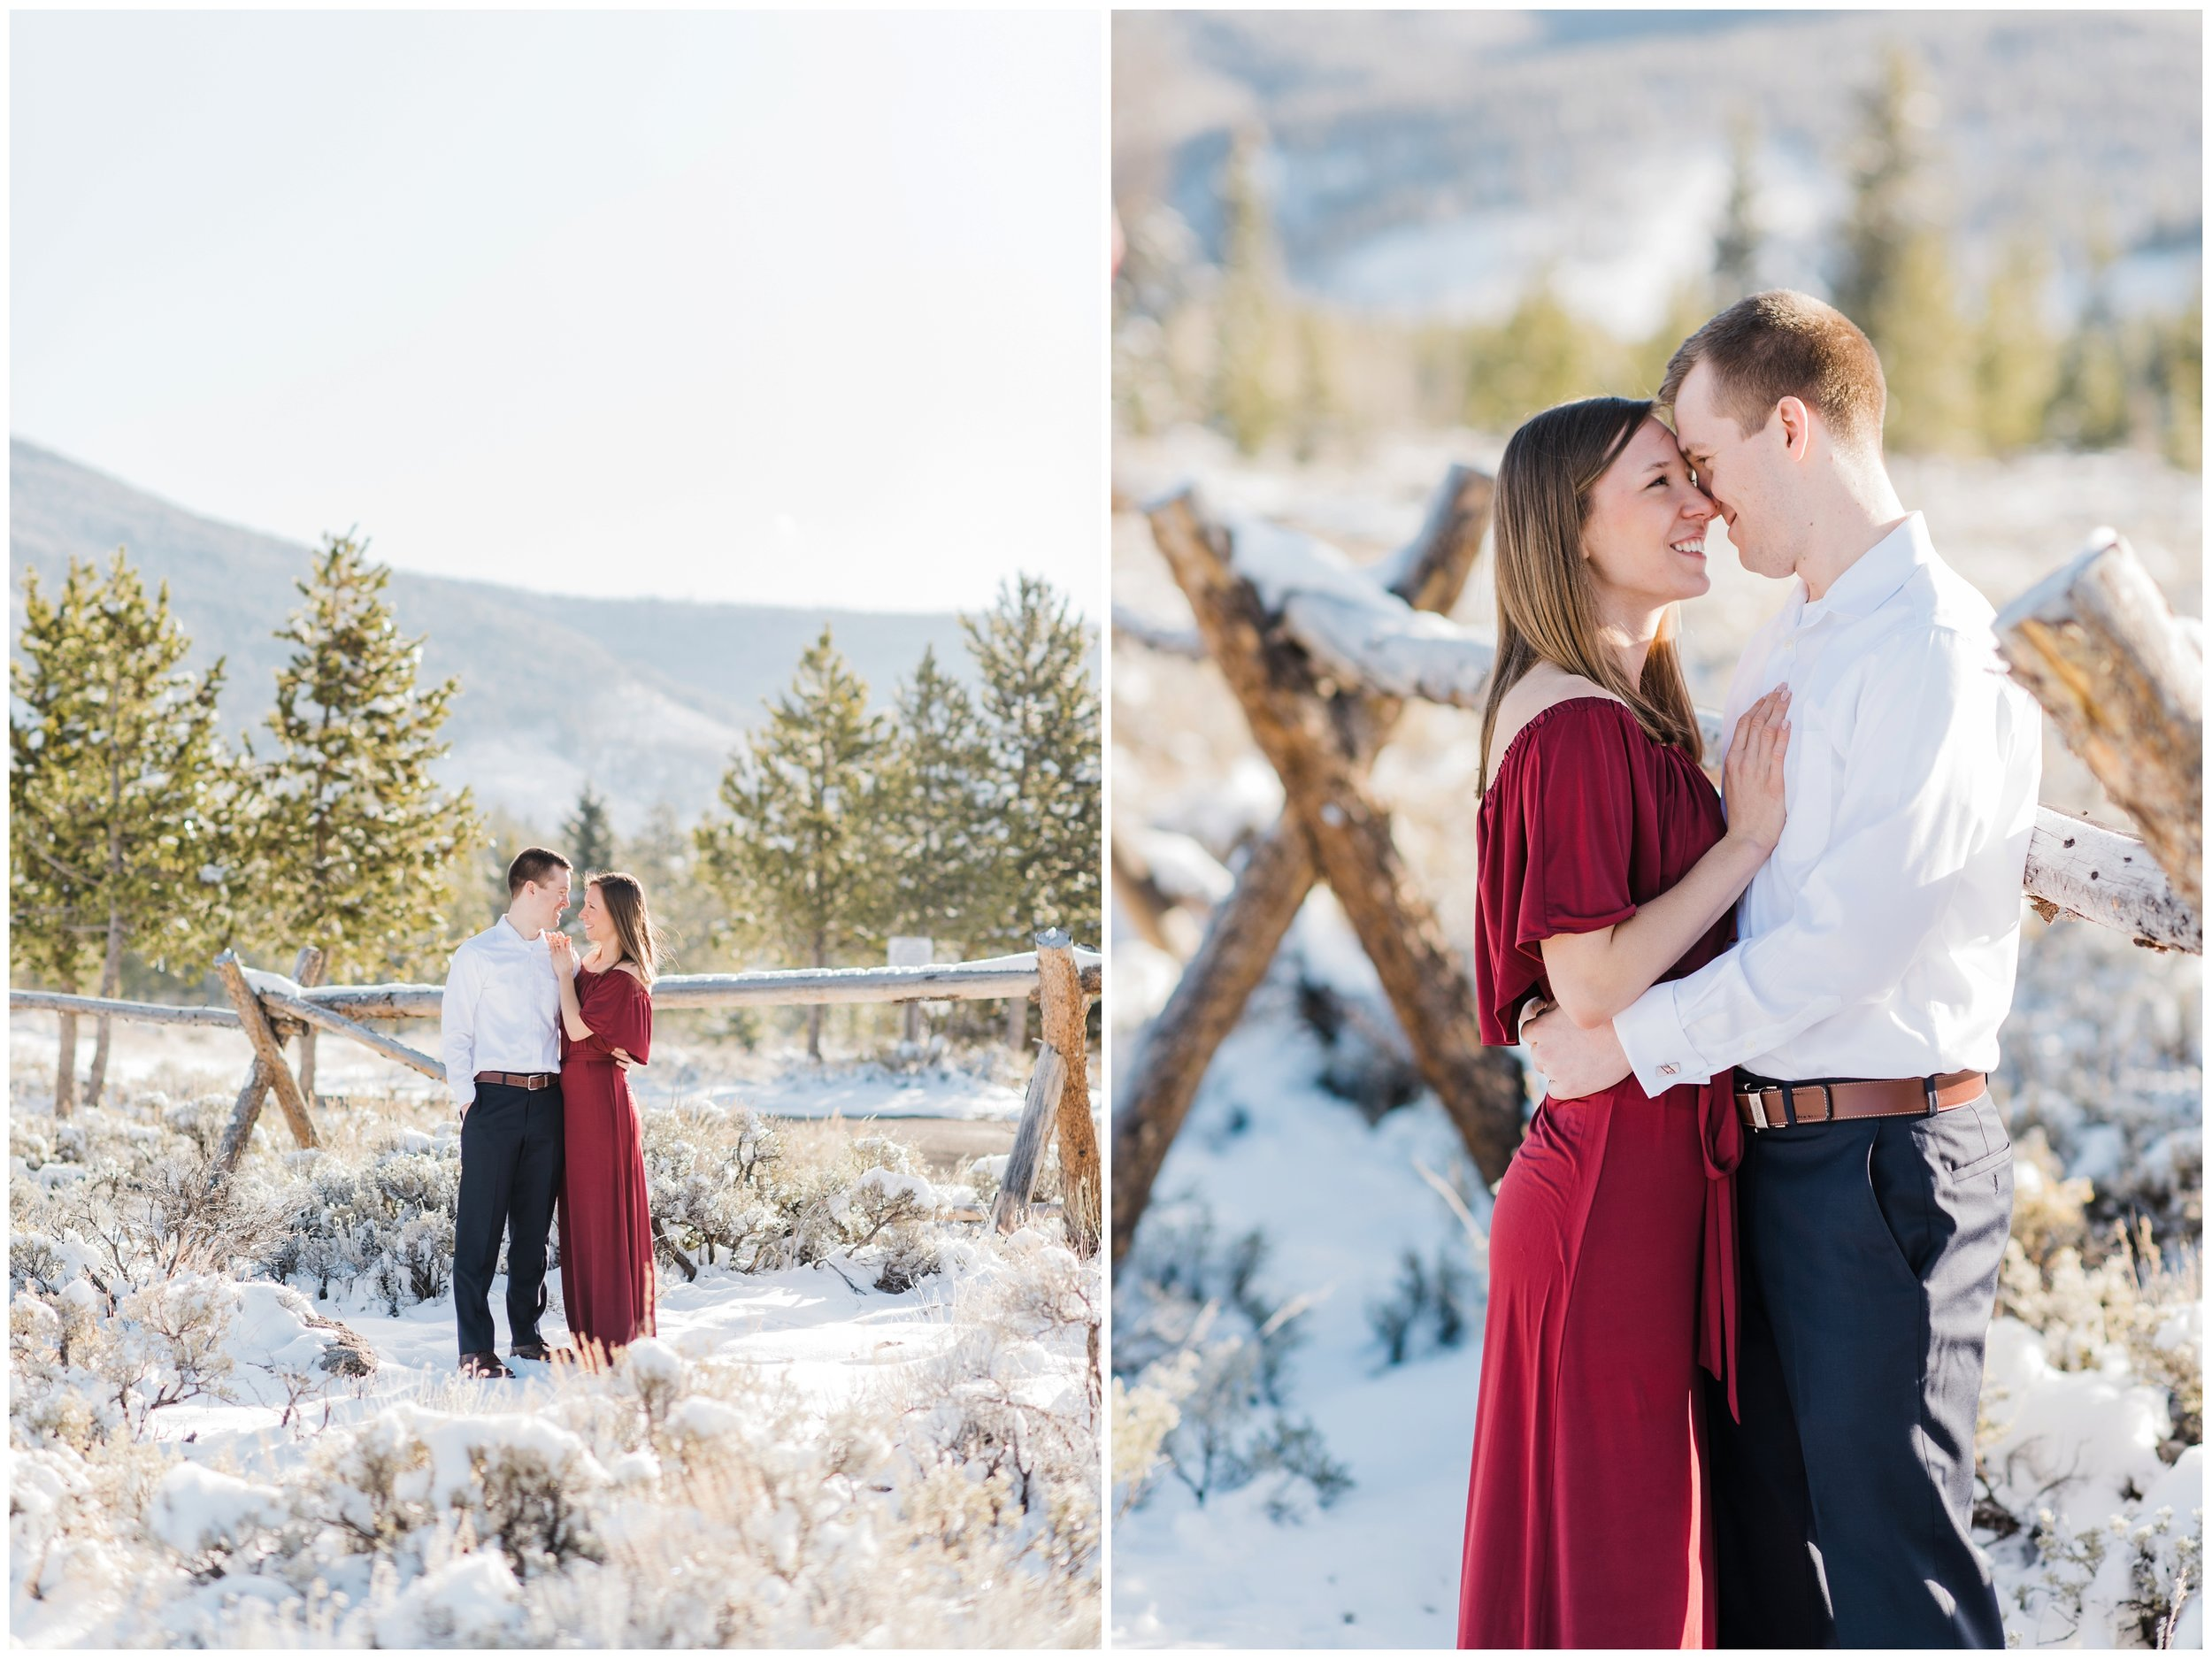 Rebecca_Shehorn_Photography_Indianapolis_Wedding_Photographer_8039.jpg